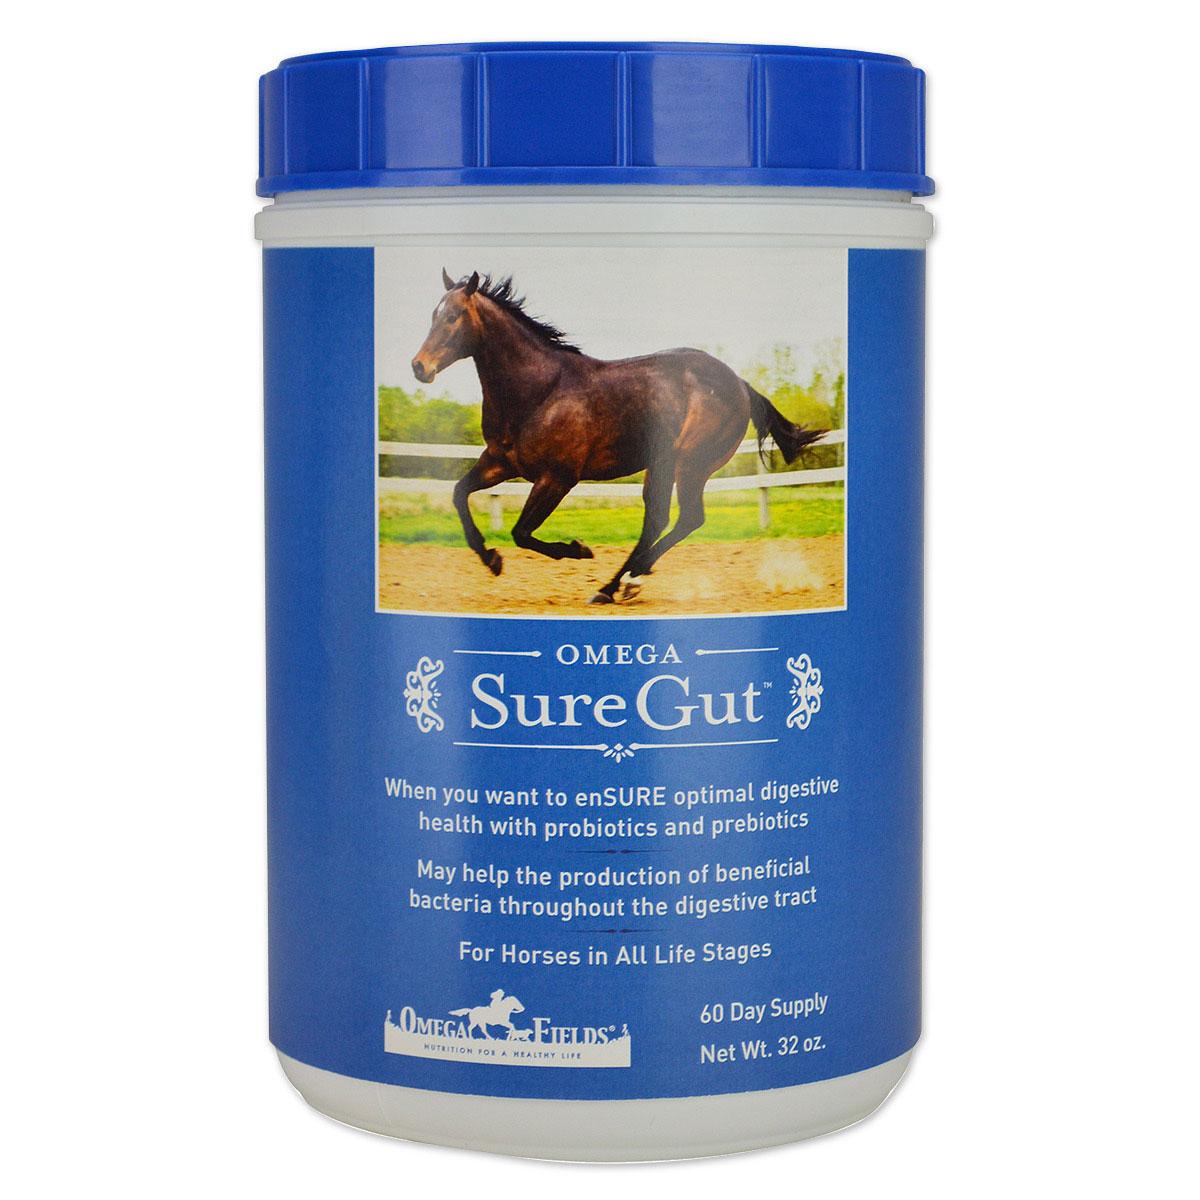 Omega Suregut Horse Supplement